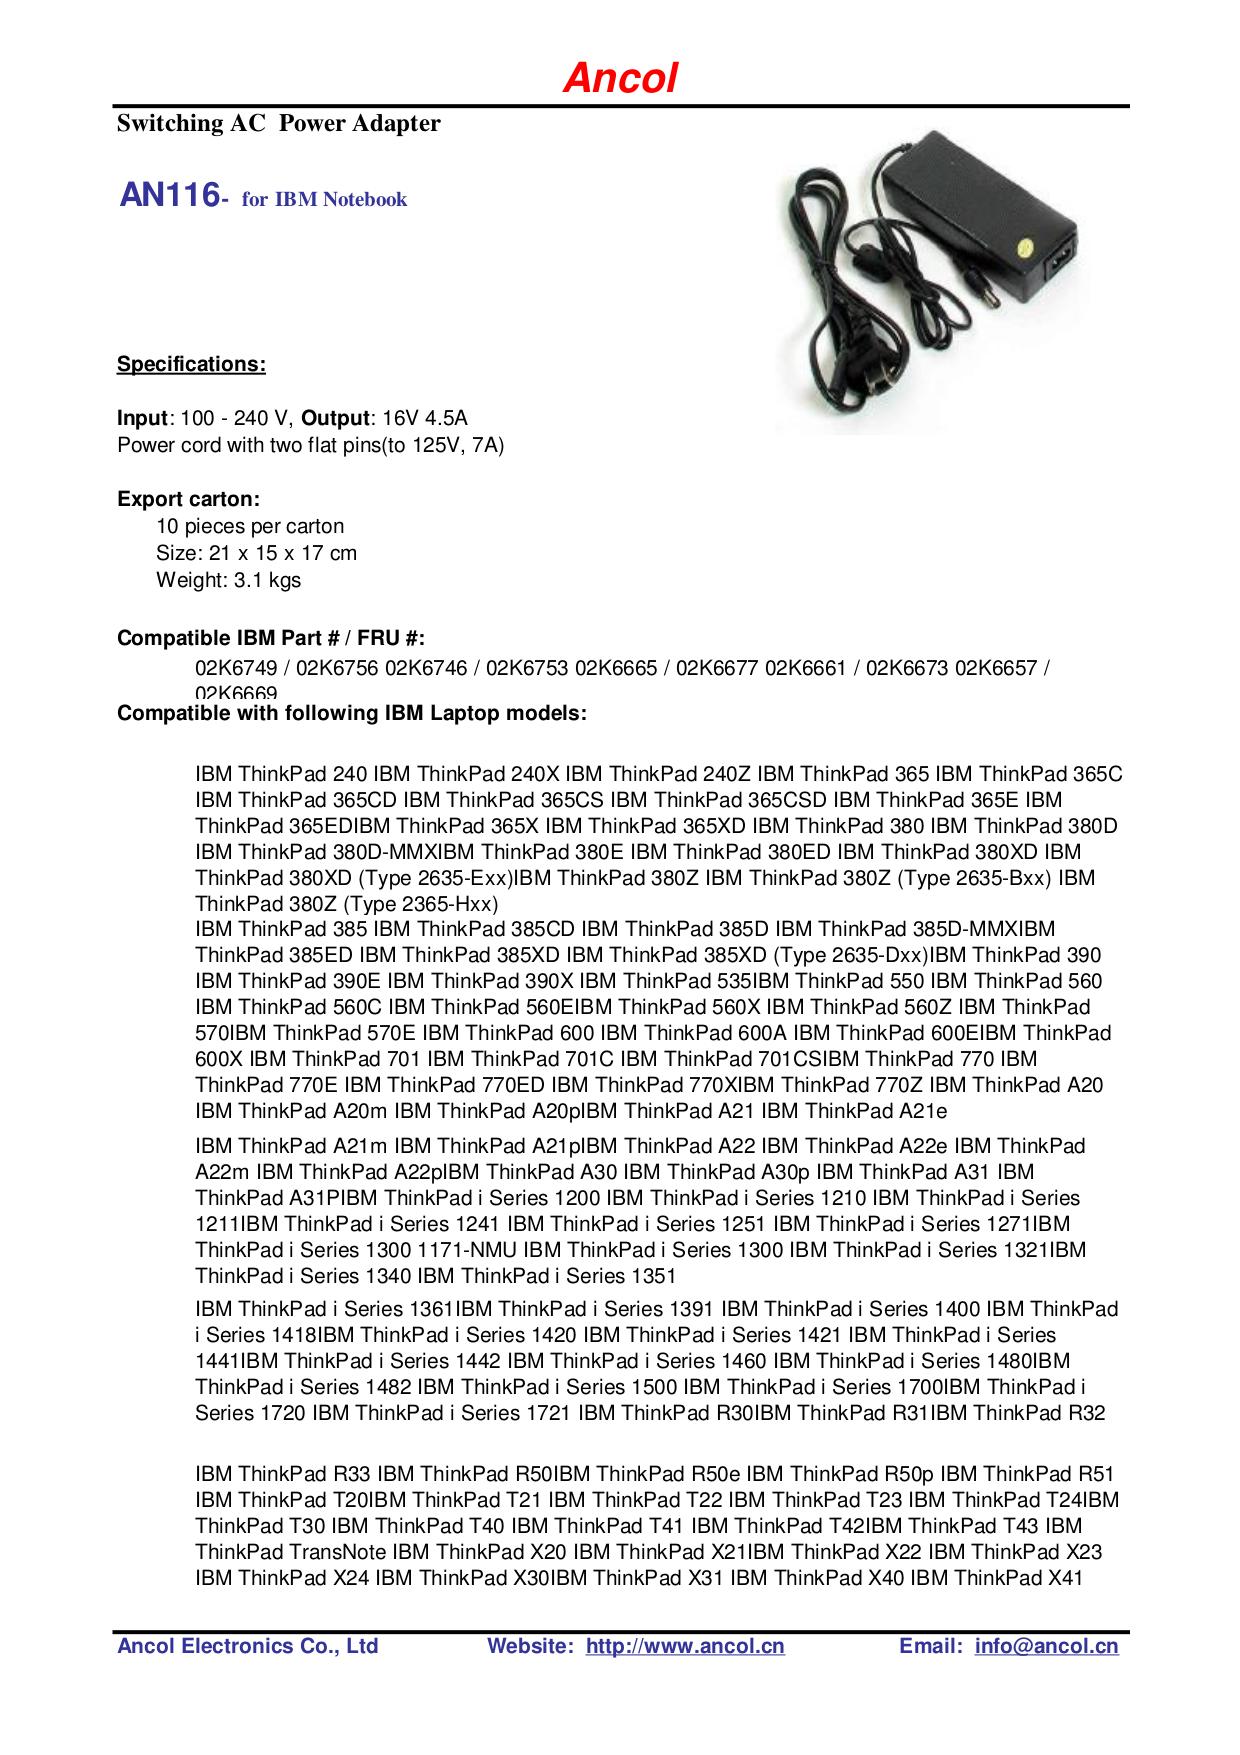 pdf for IBM Laptop ThinkPad 385D manual